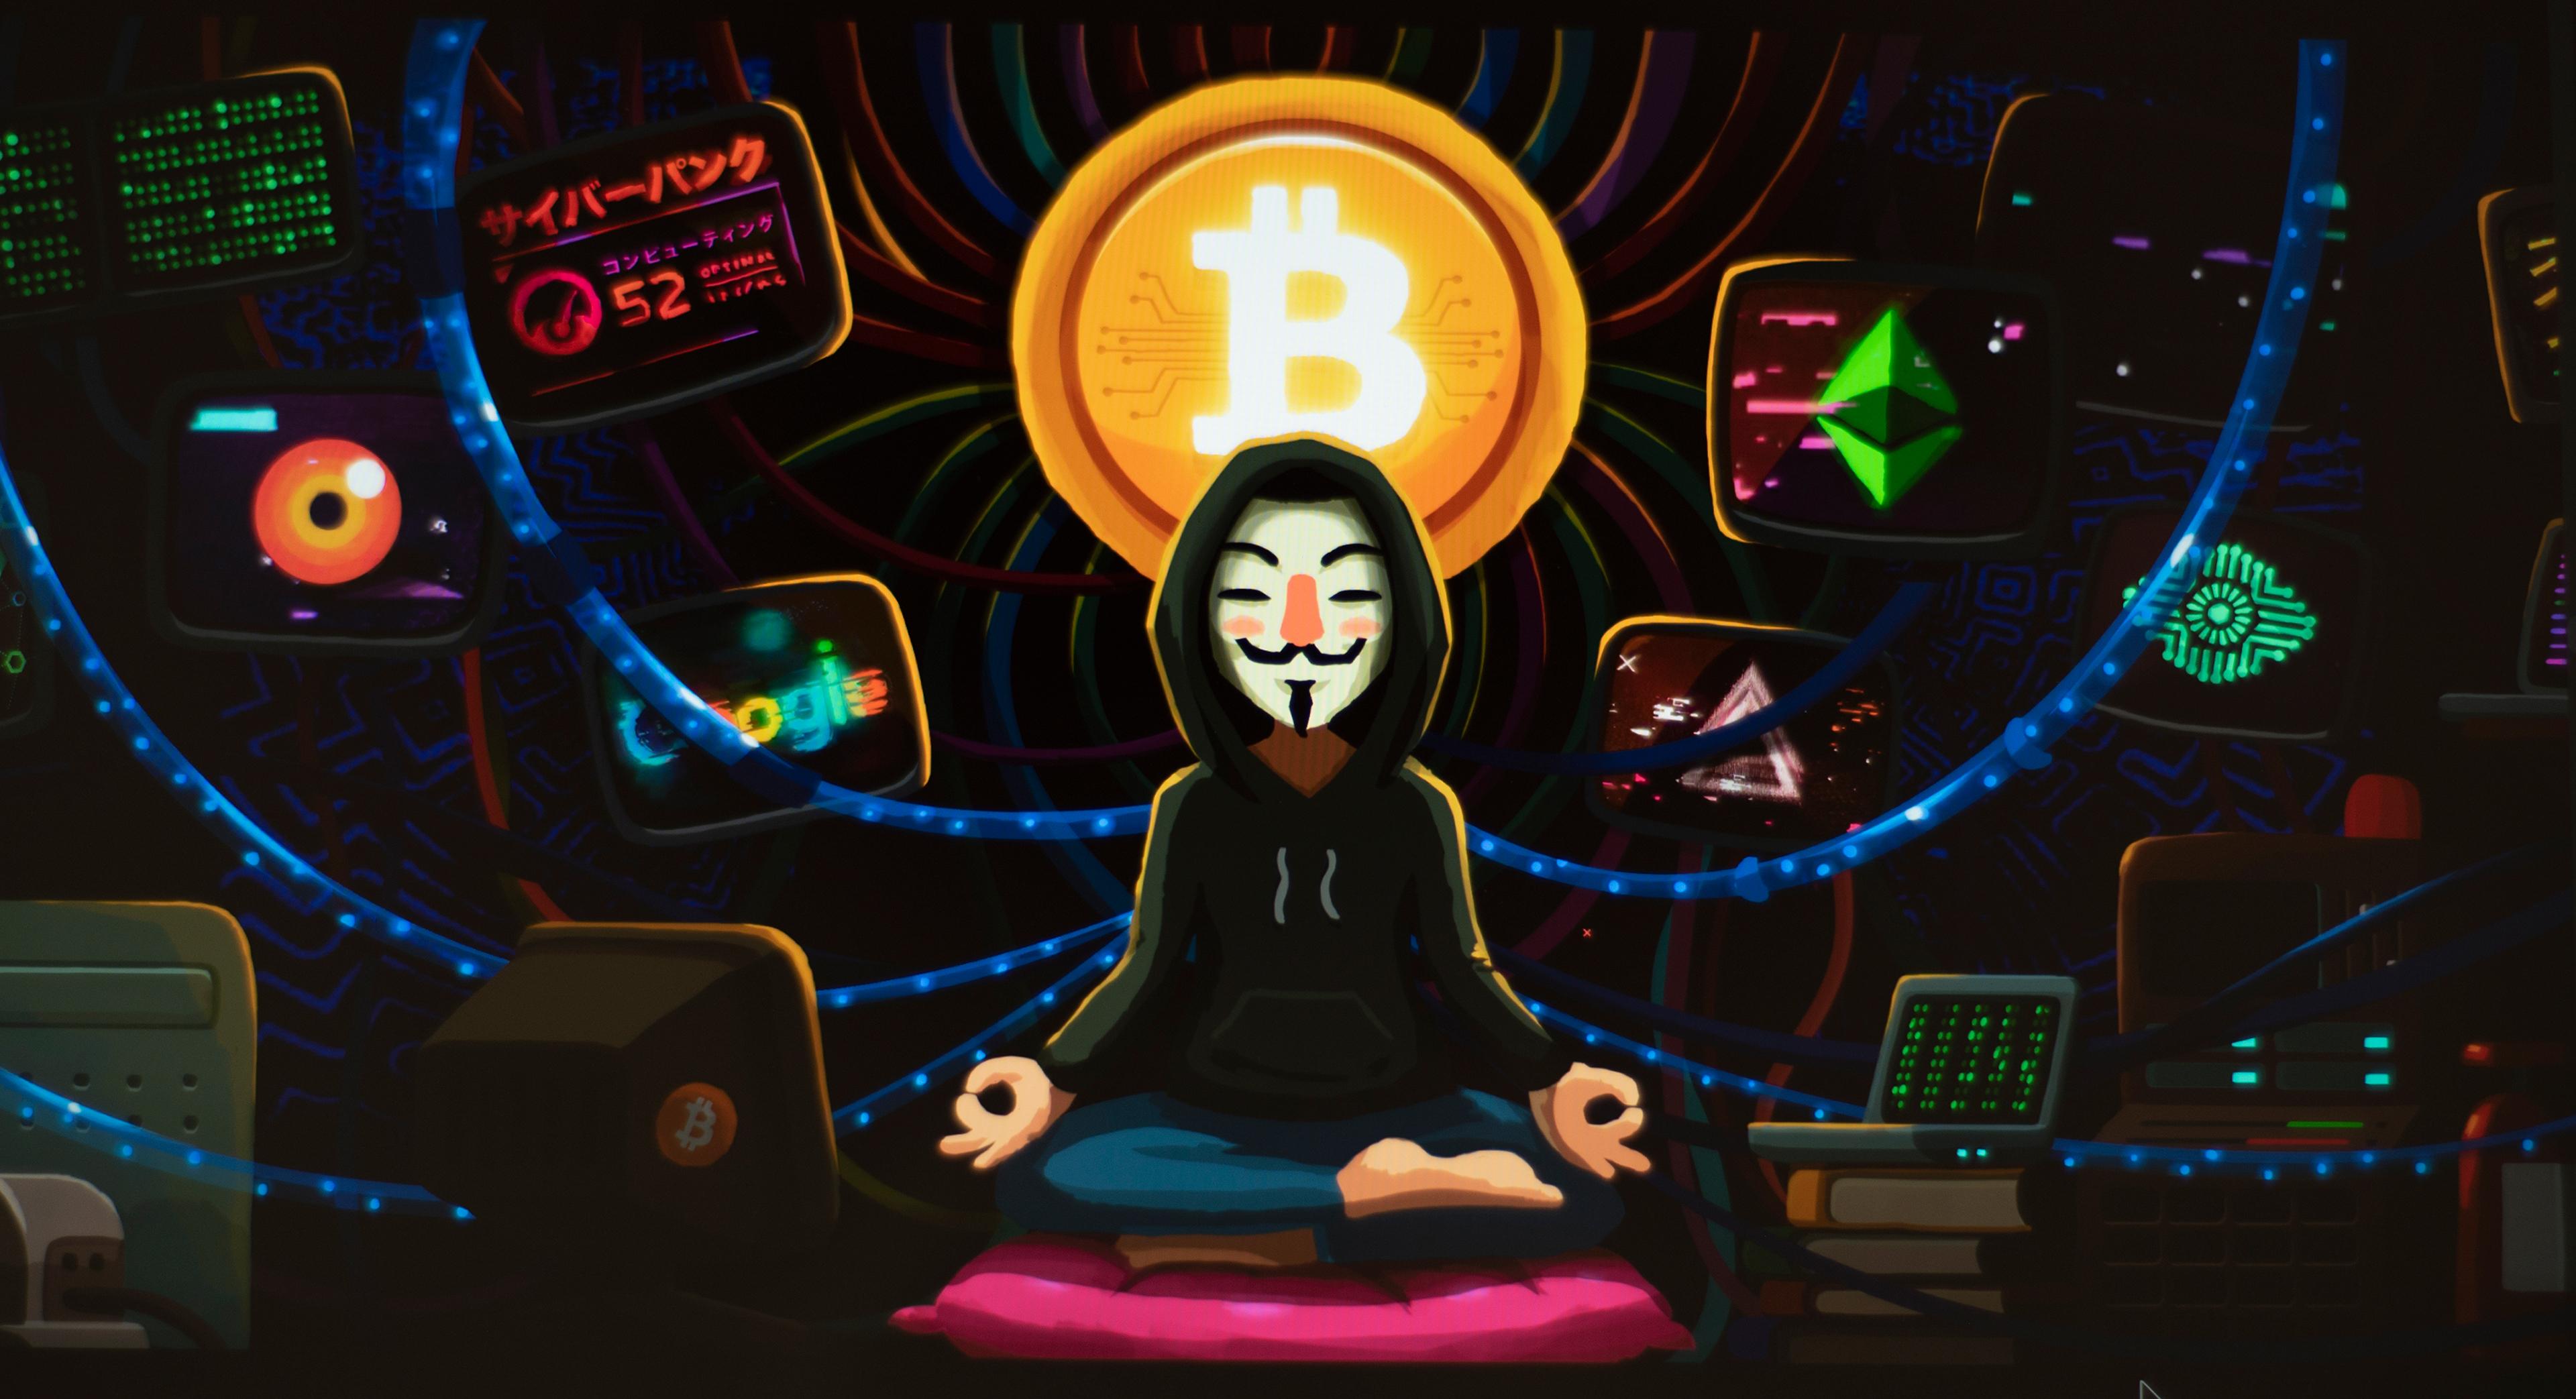 Bitcoin Anonymous   3840x2086   Download HD Wallpaper   WallpaperTip 3840x2086